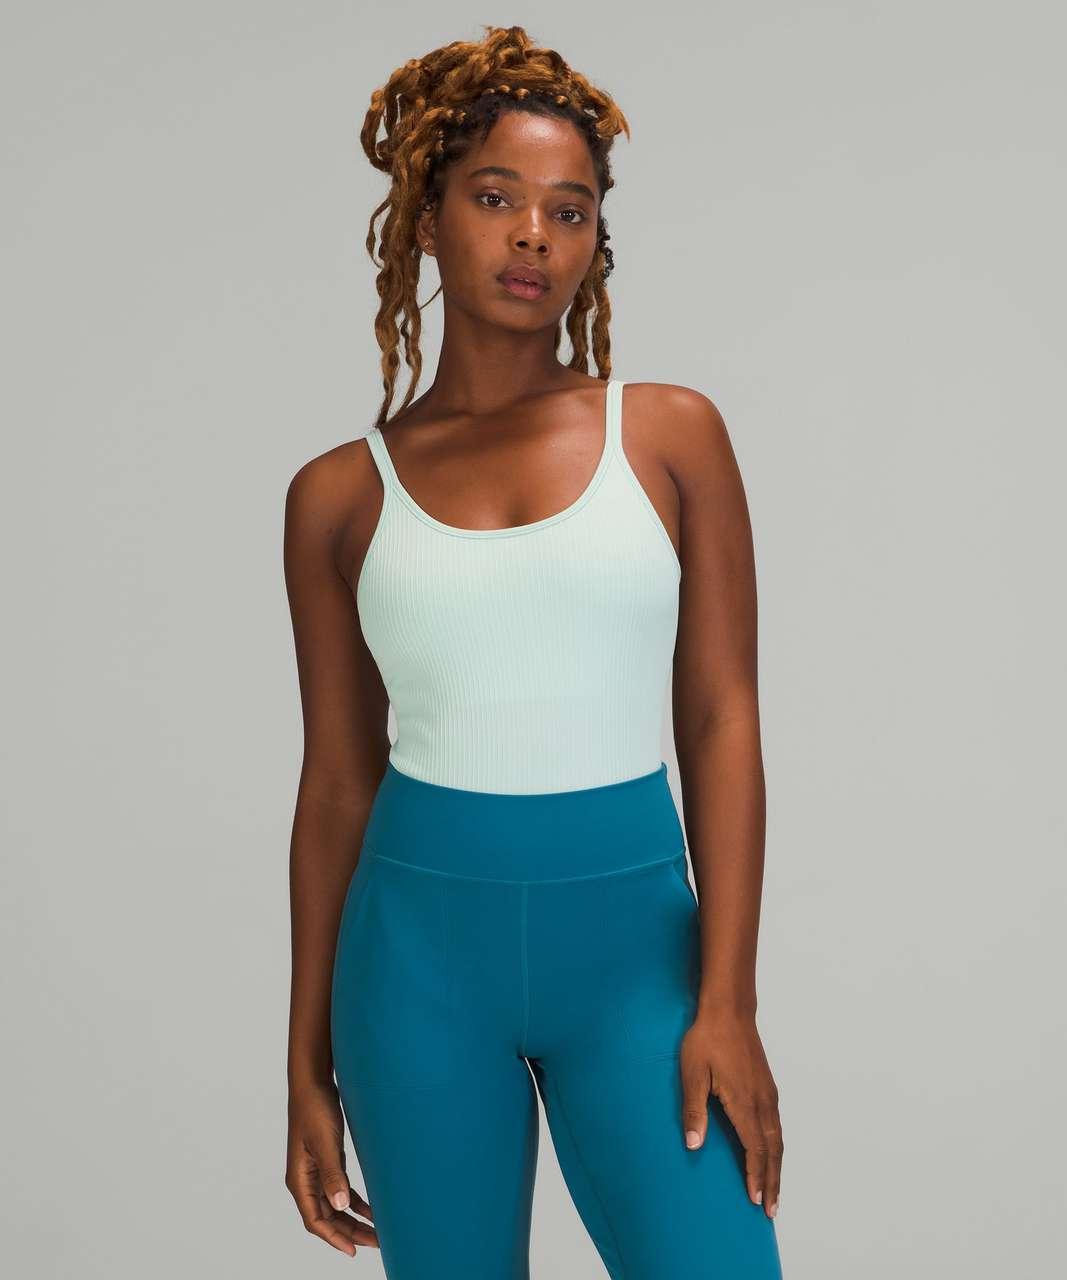 Lululemon Ebb to Street Bodysuit *Light Support, B/C Cups - Delicate Mint